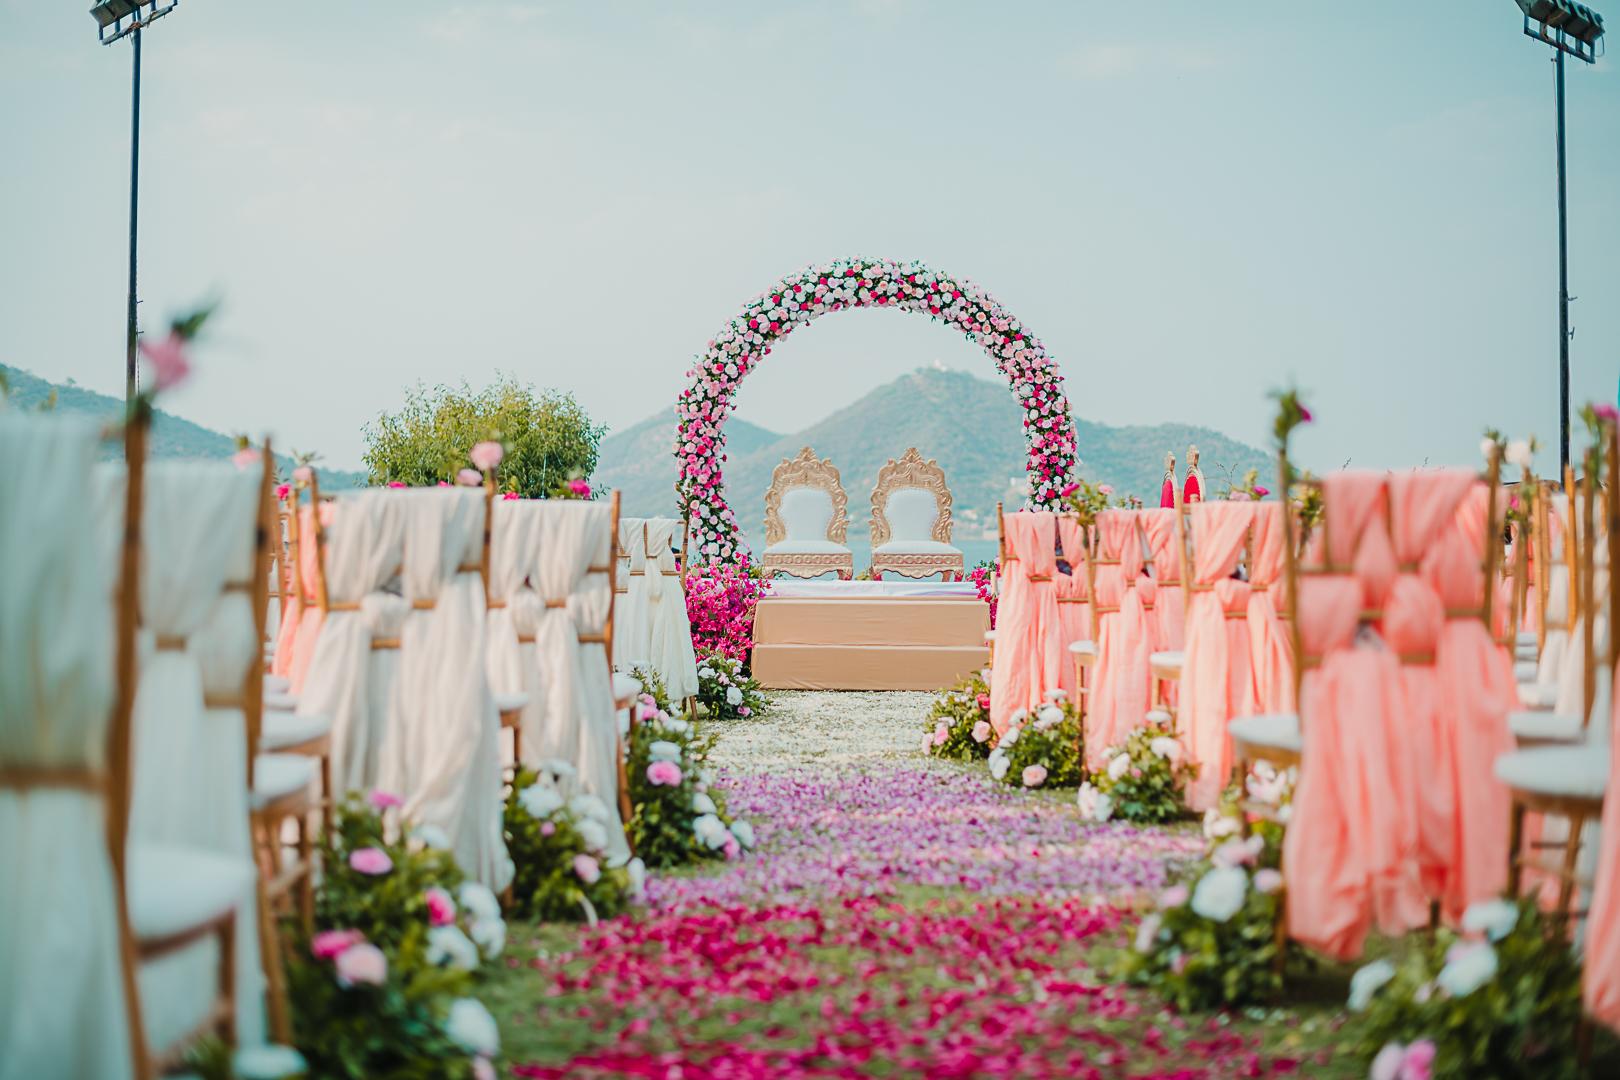 pastel wedding decor by the lake